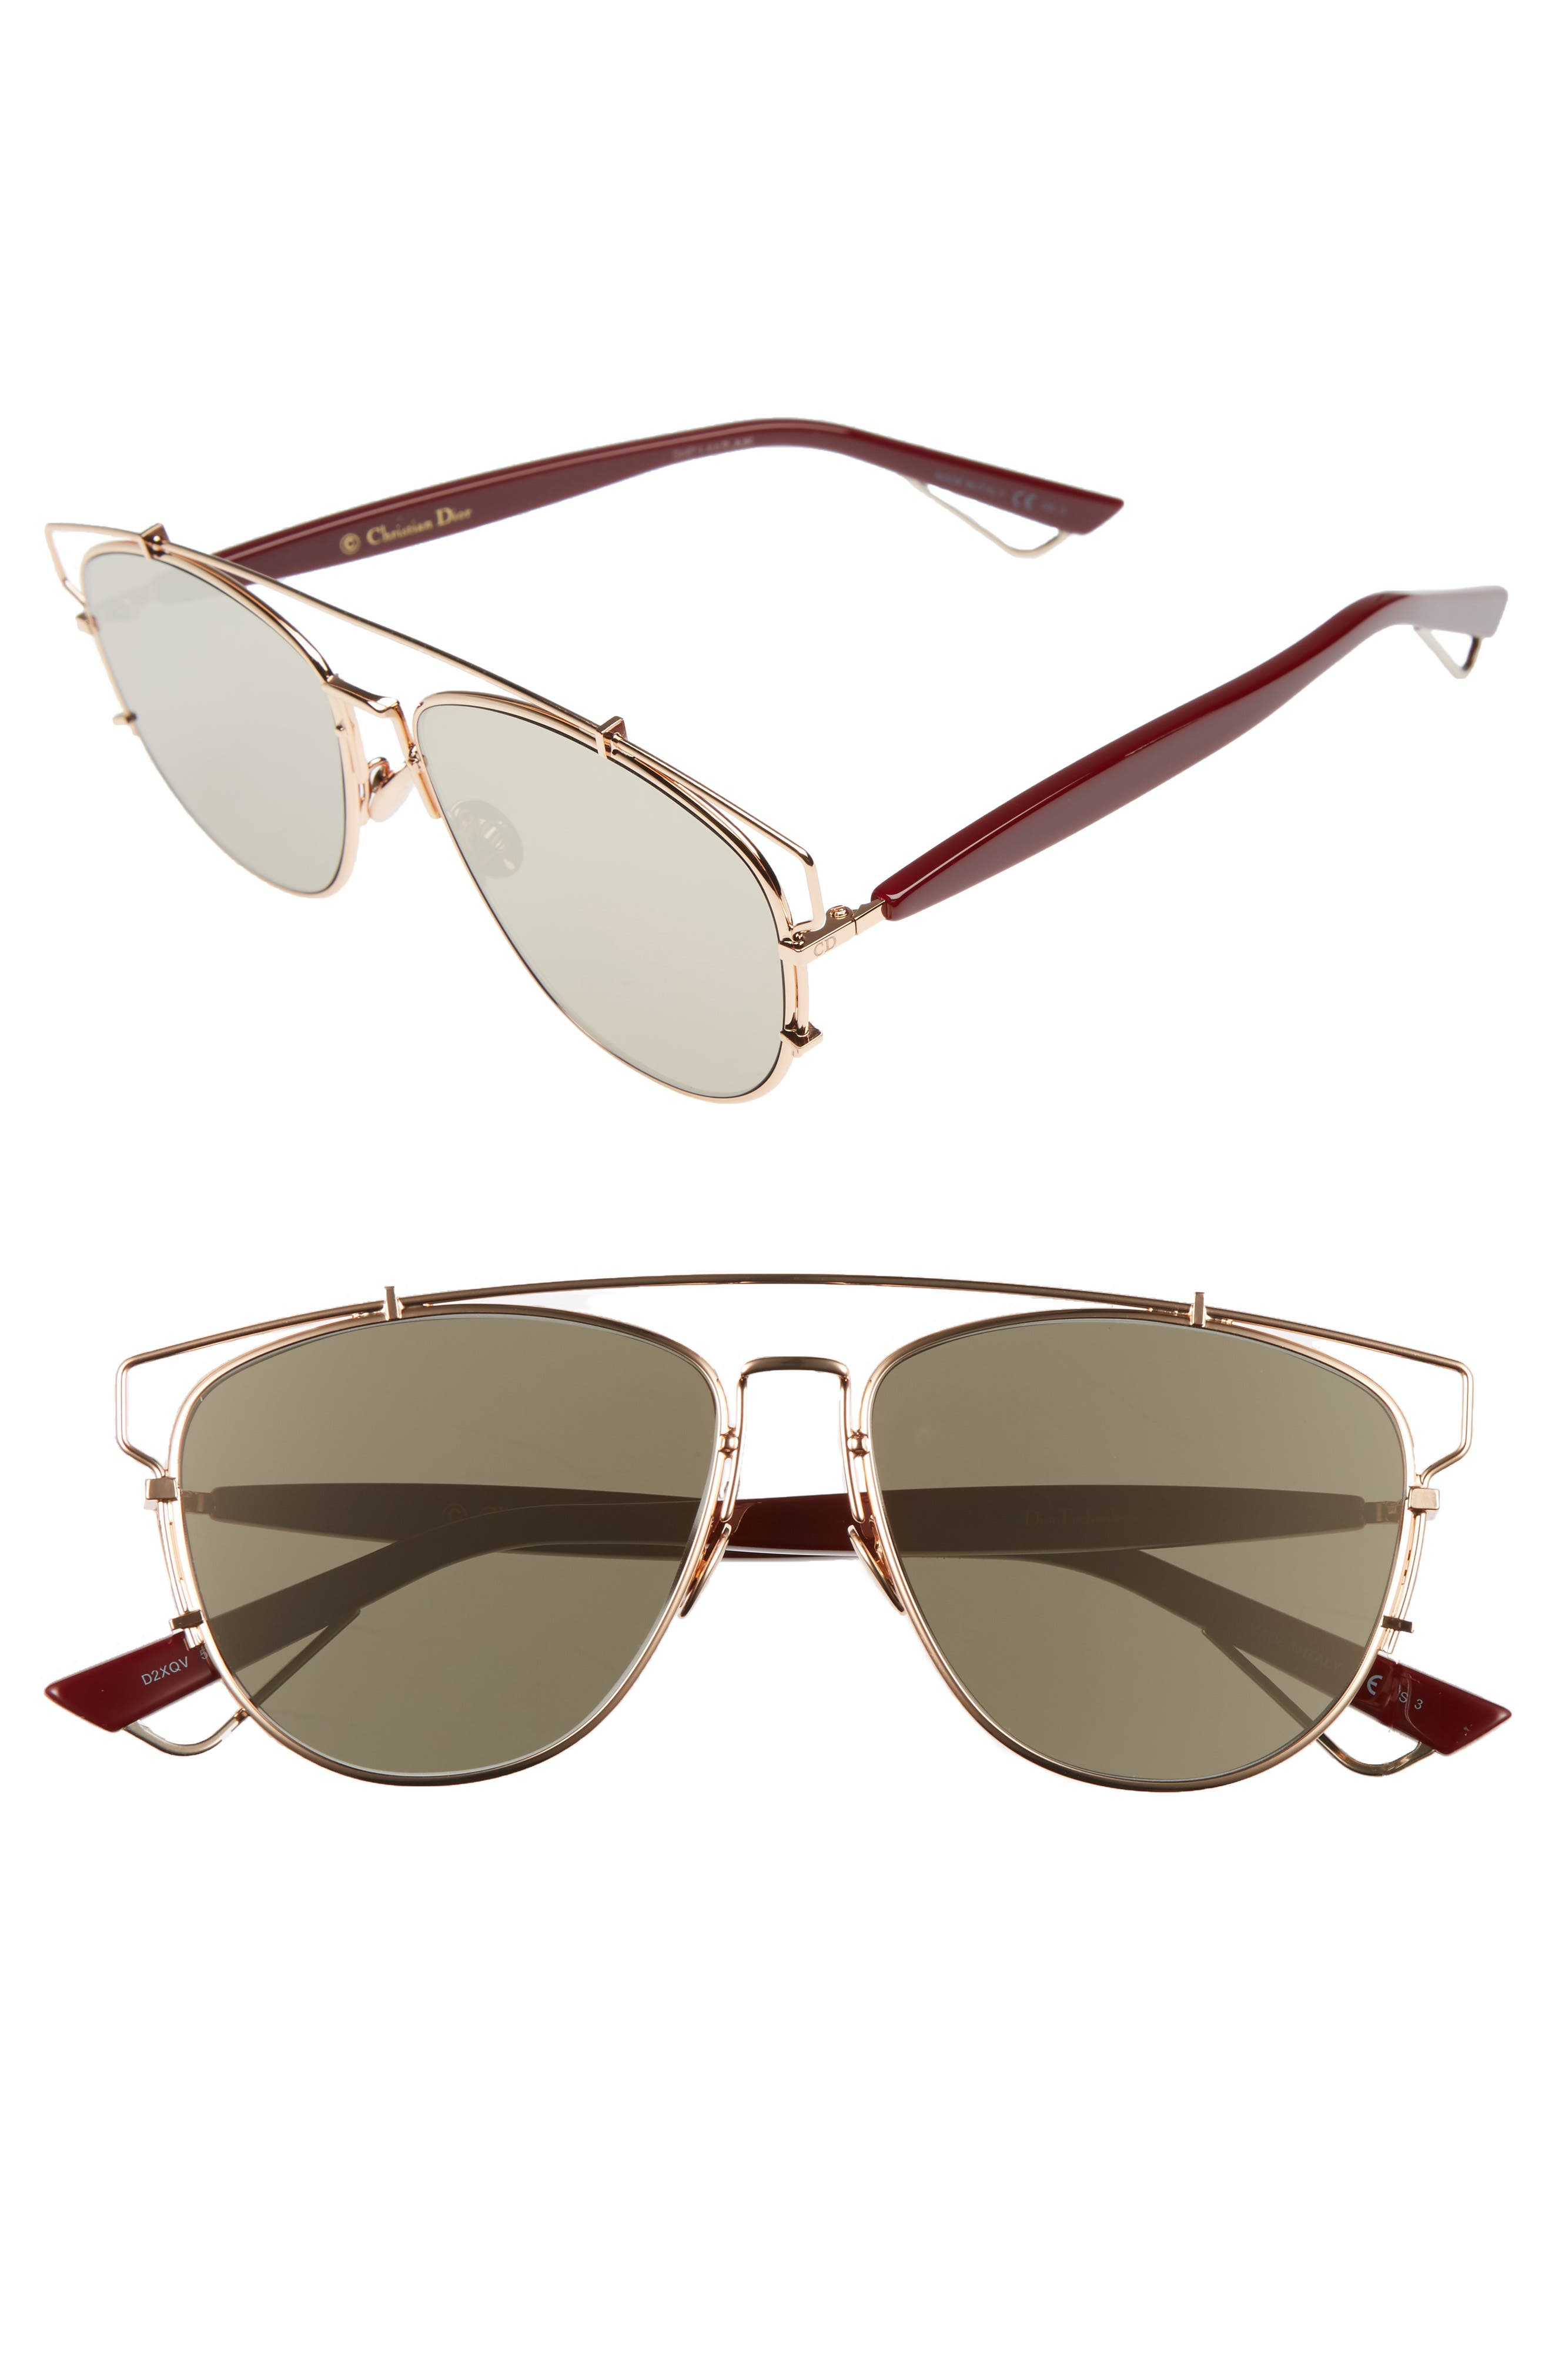 Main Image - Dior Technologic 57mm Brow Bar Sunglasses